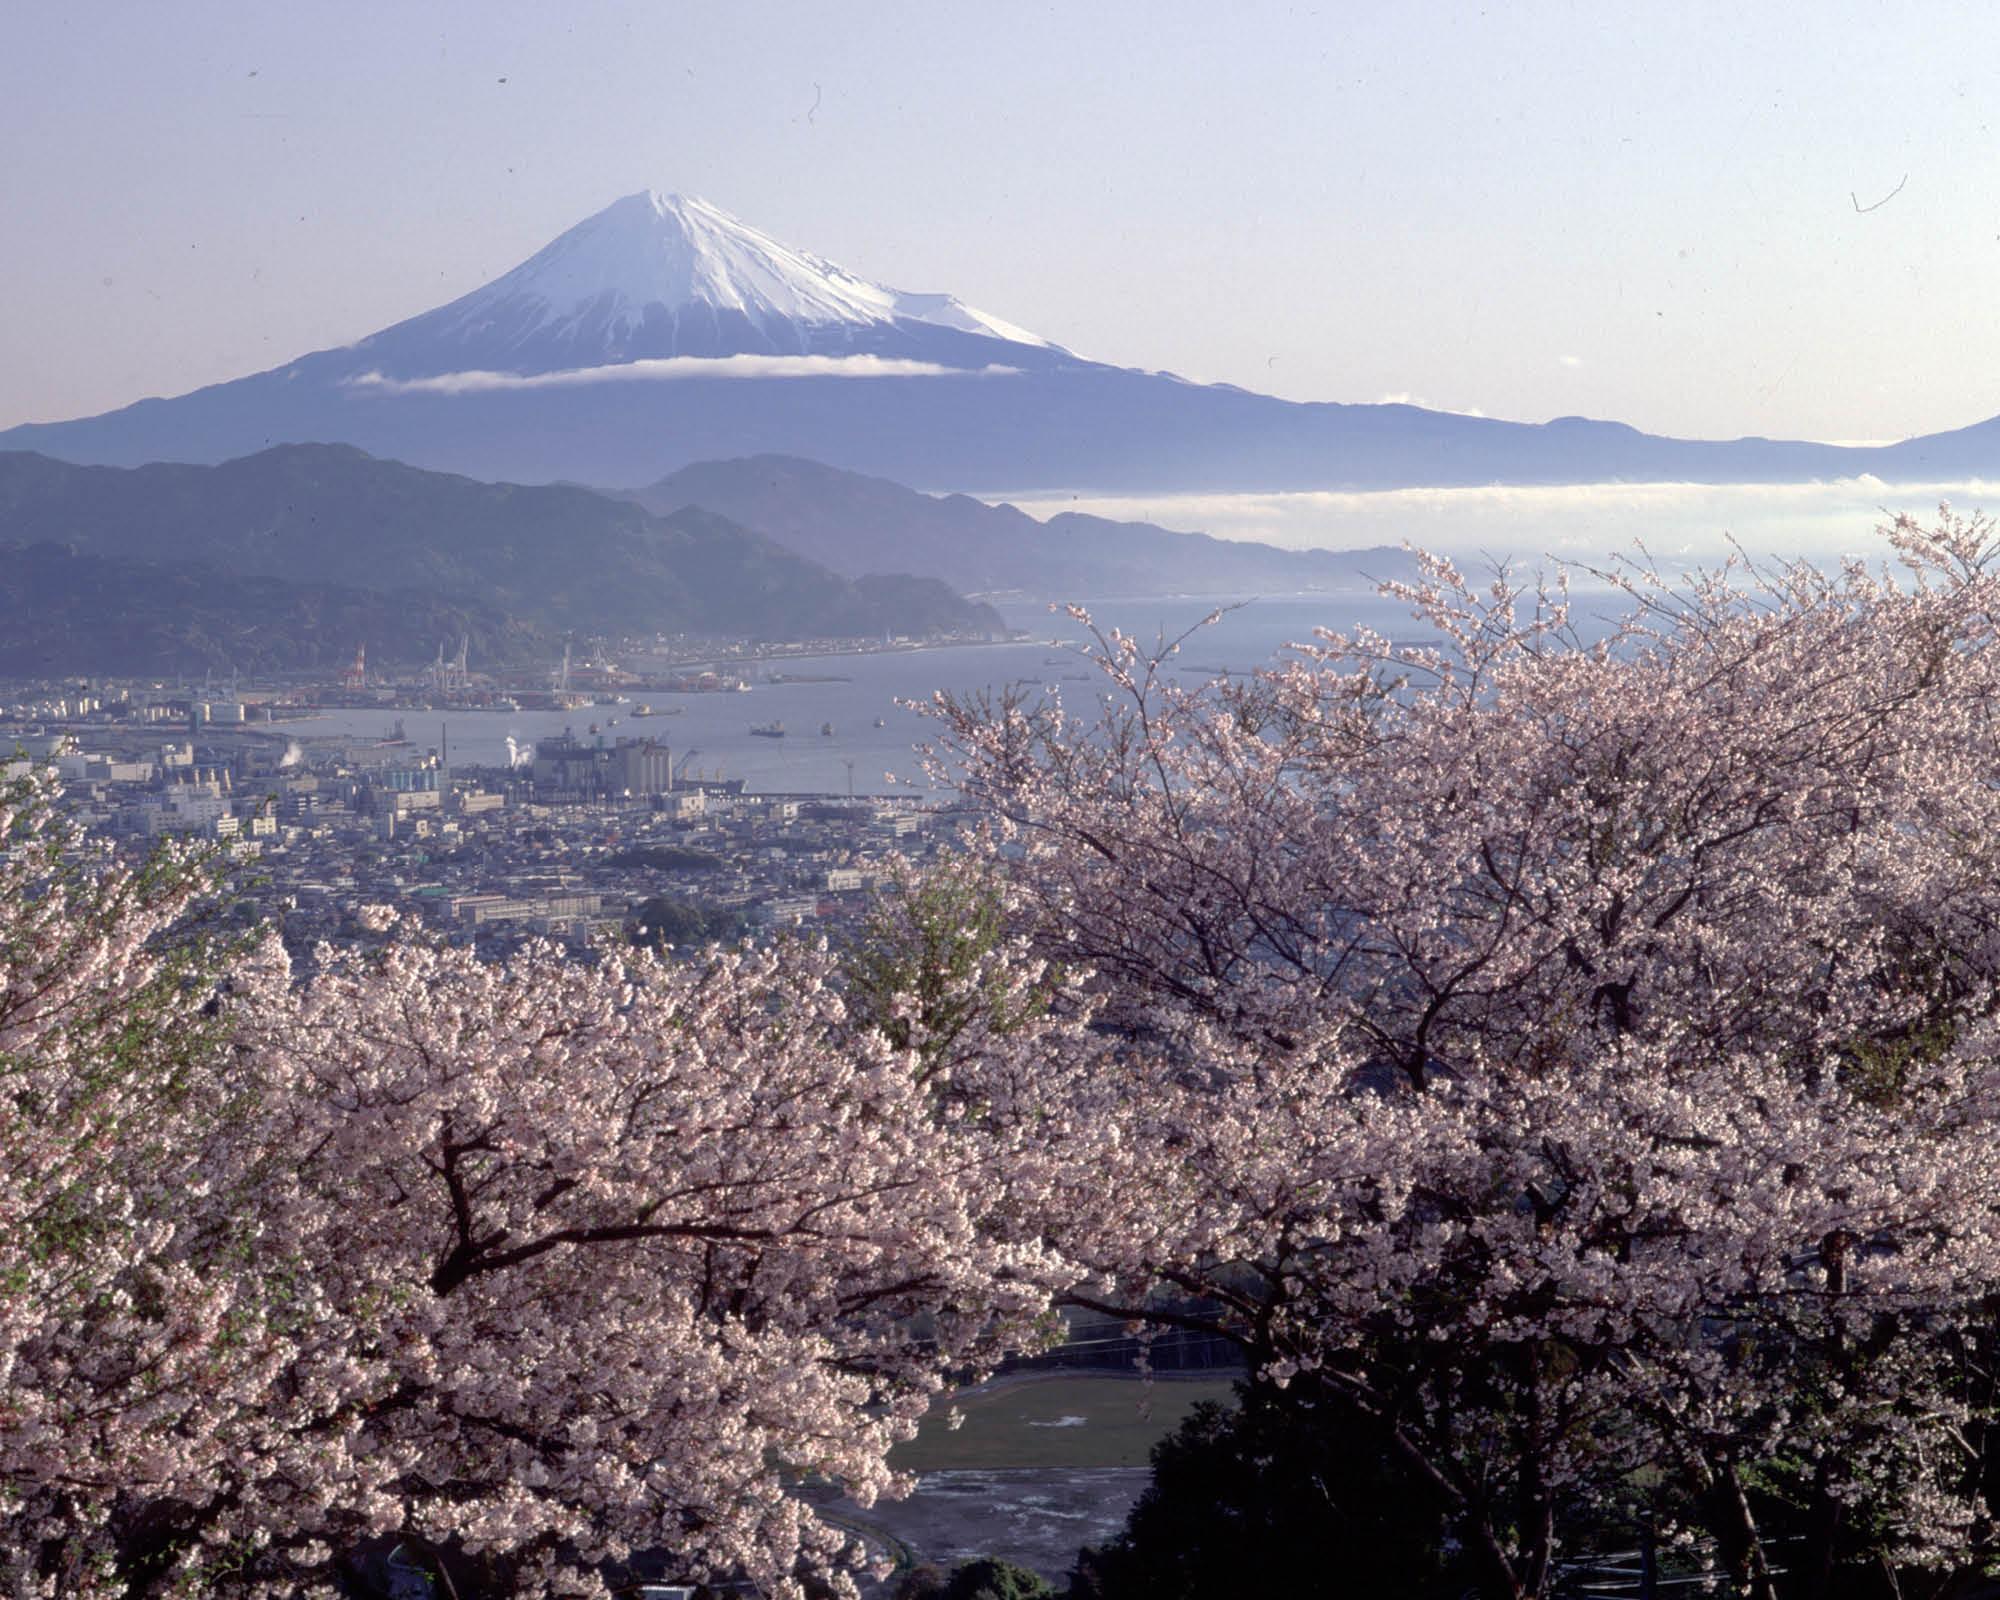 https://www.shizuoka-cb.com/wp-content/uploads/2021/03/photo-why13.jpg